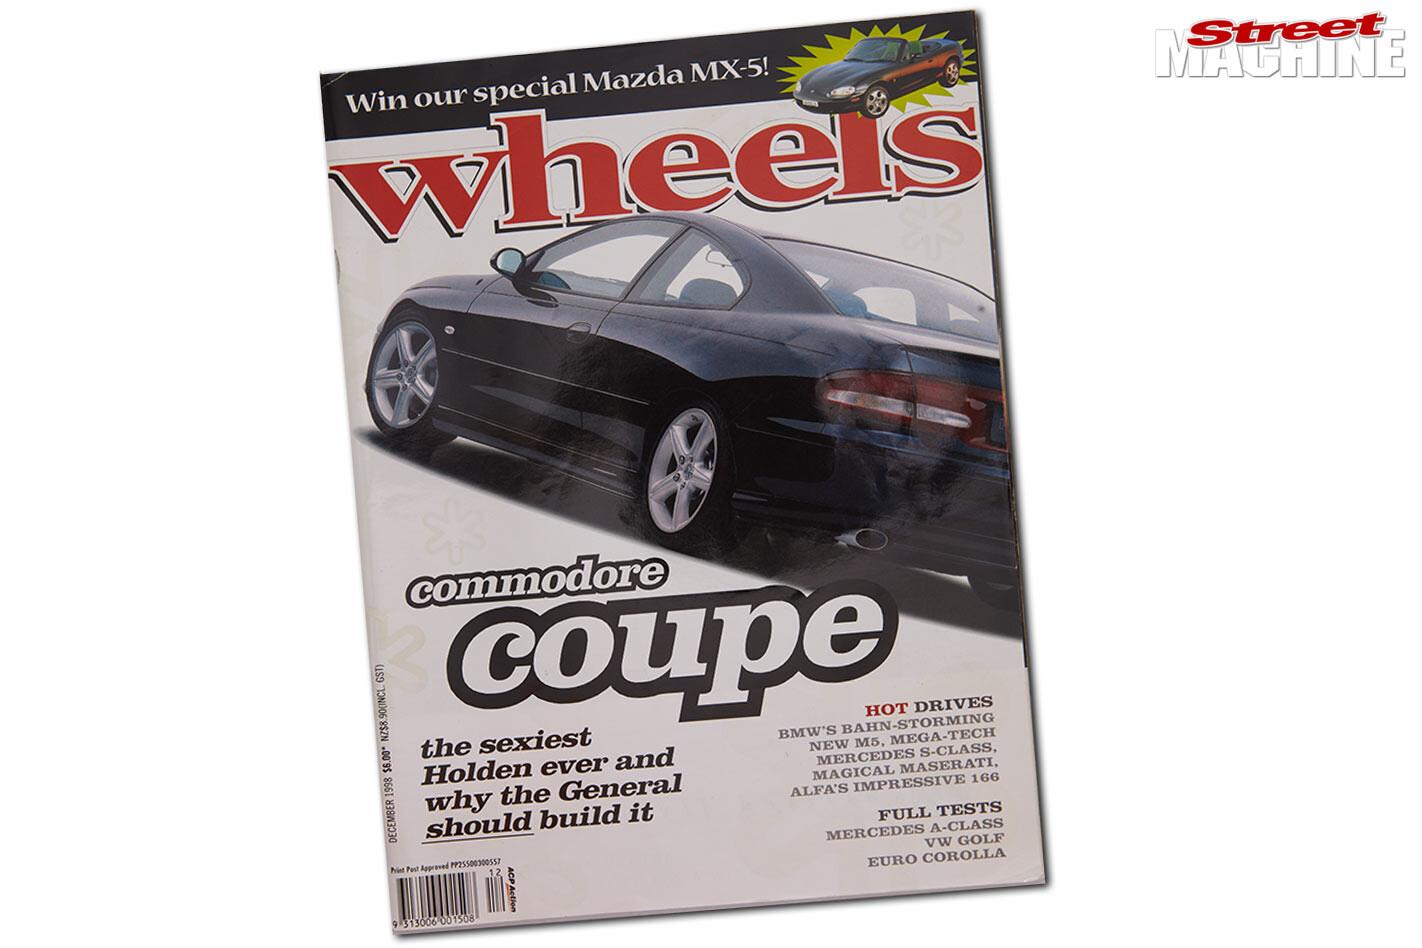 Holden VT Commodore coupe